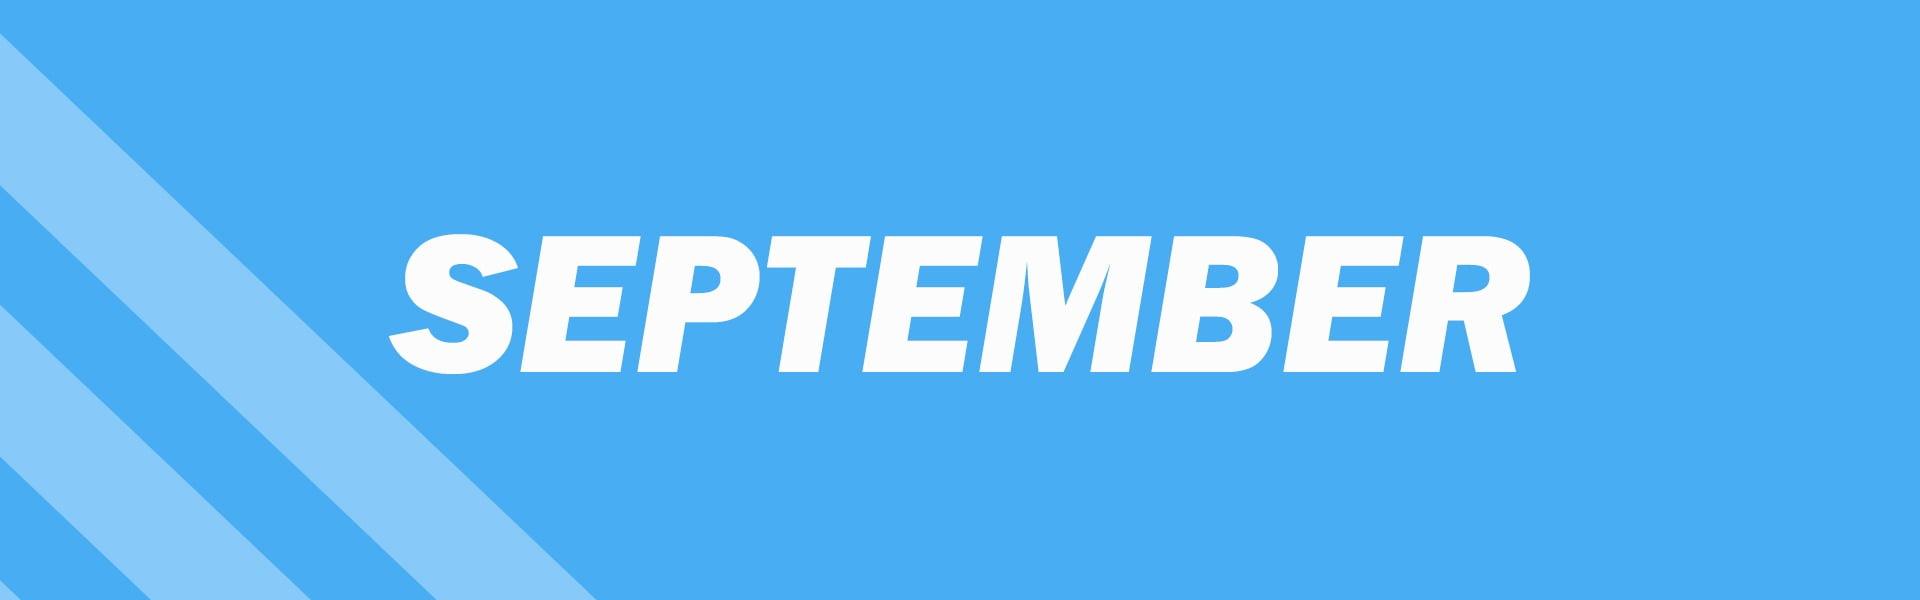 september_declaration-banner